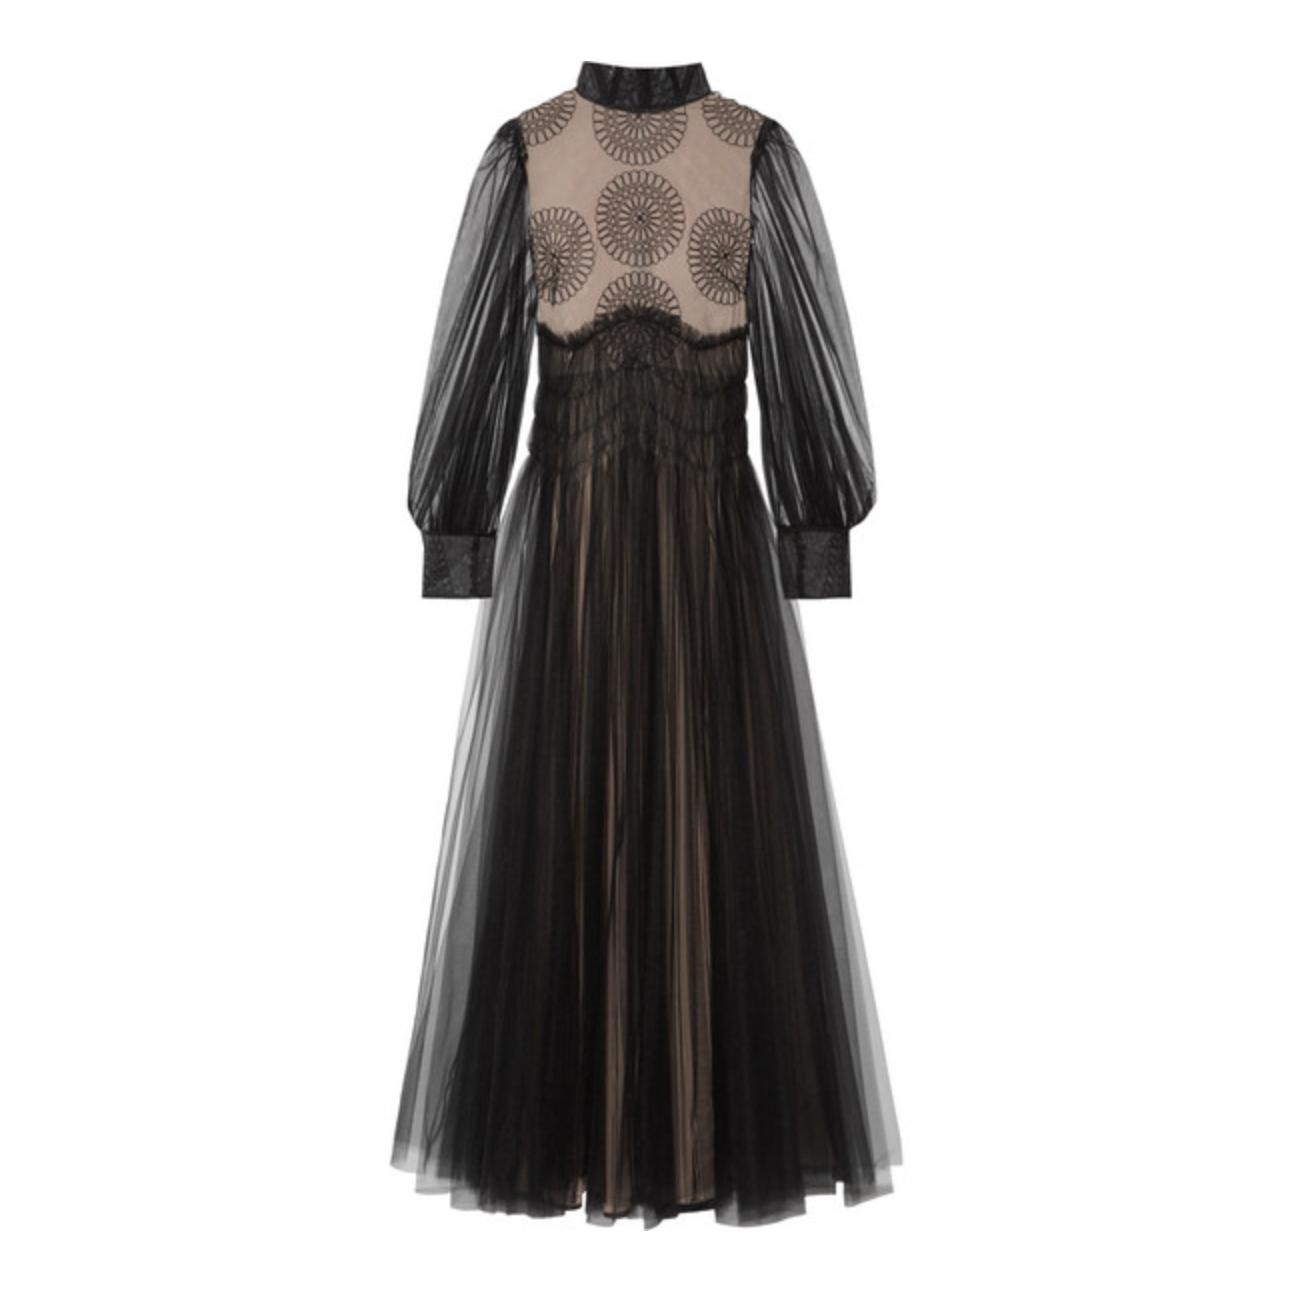 Valentino's appliquéd tulle gown